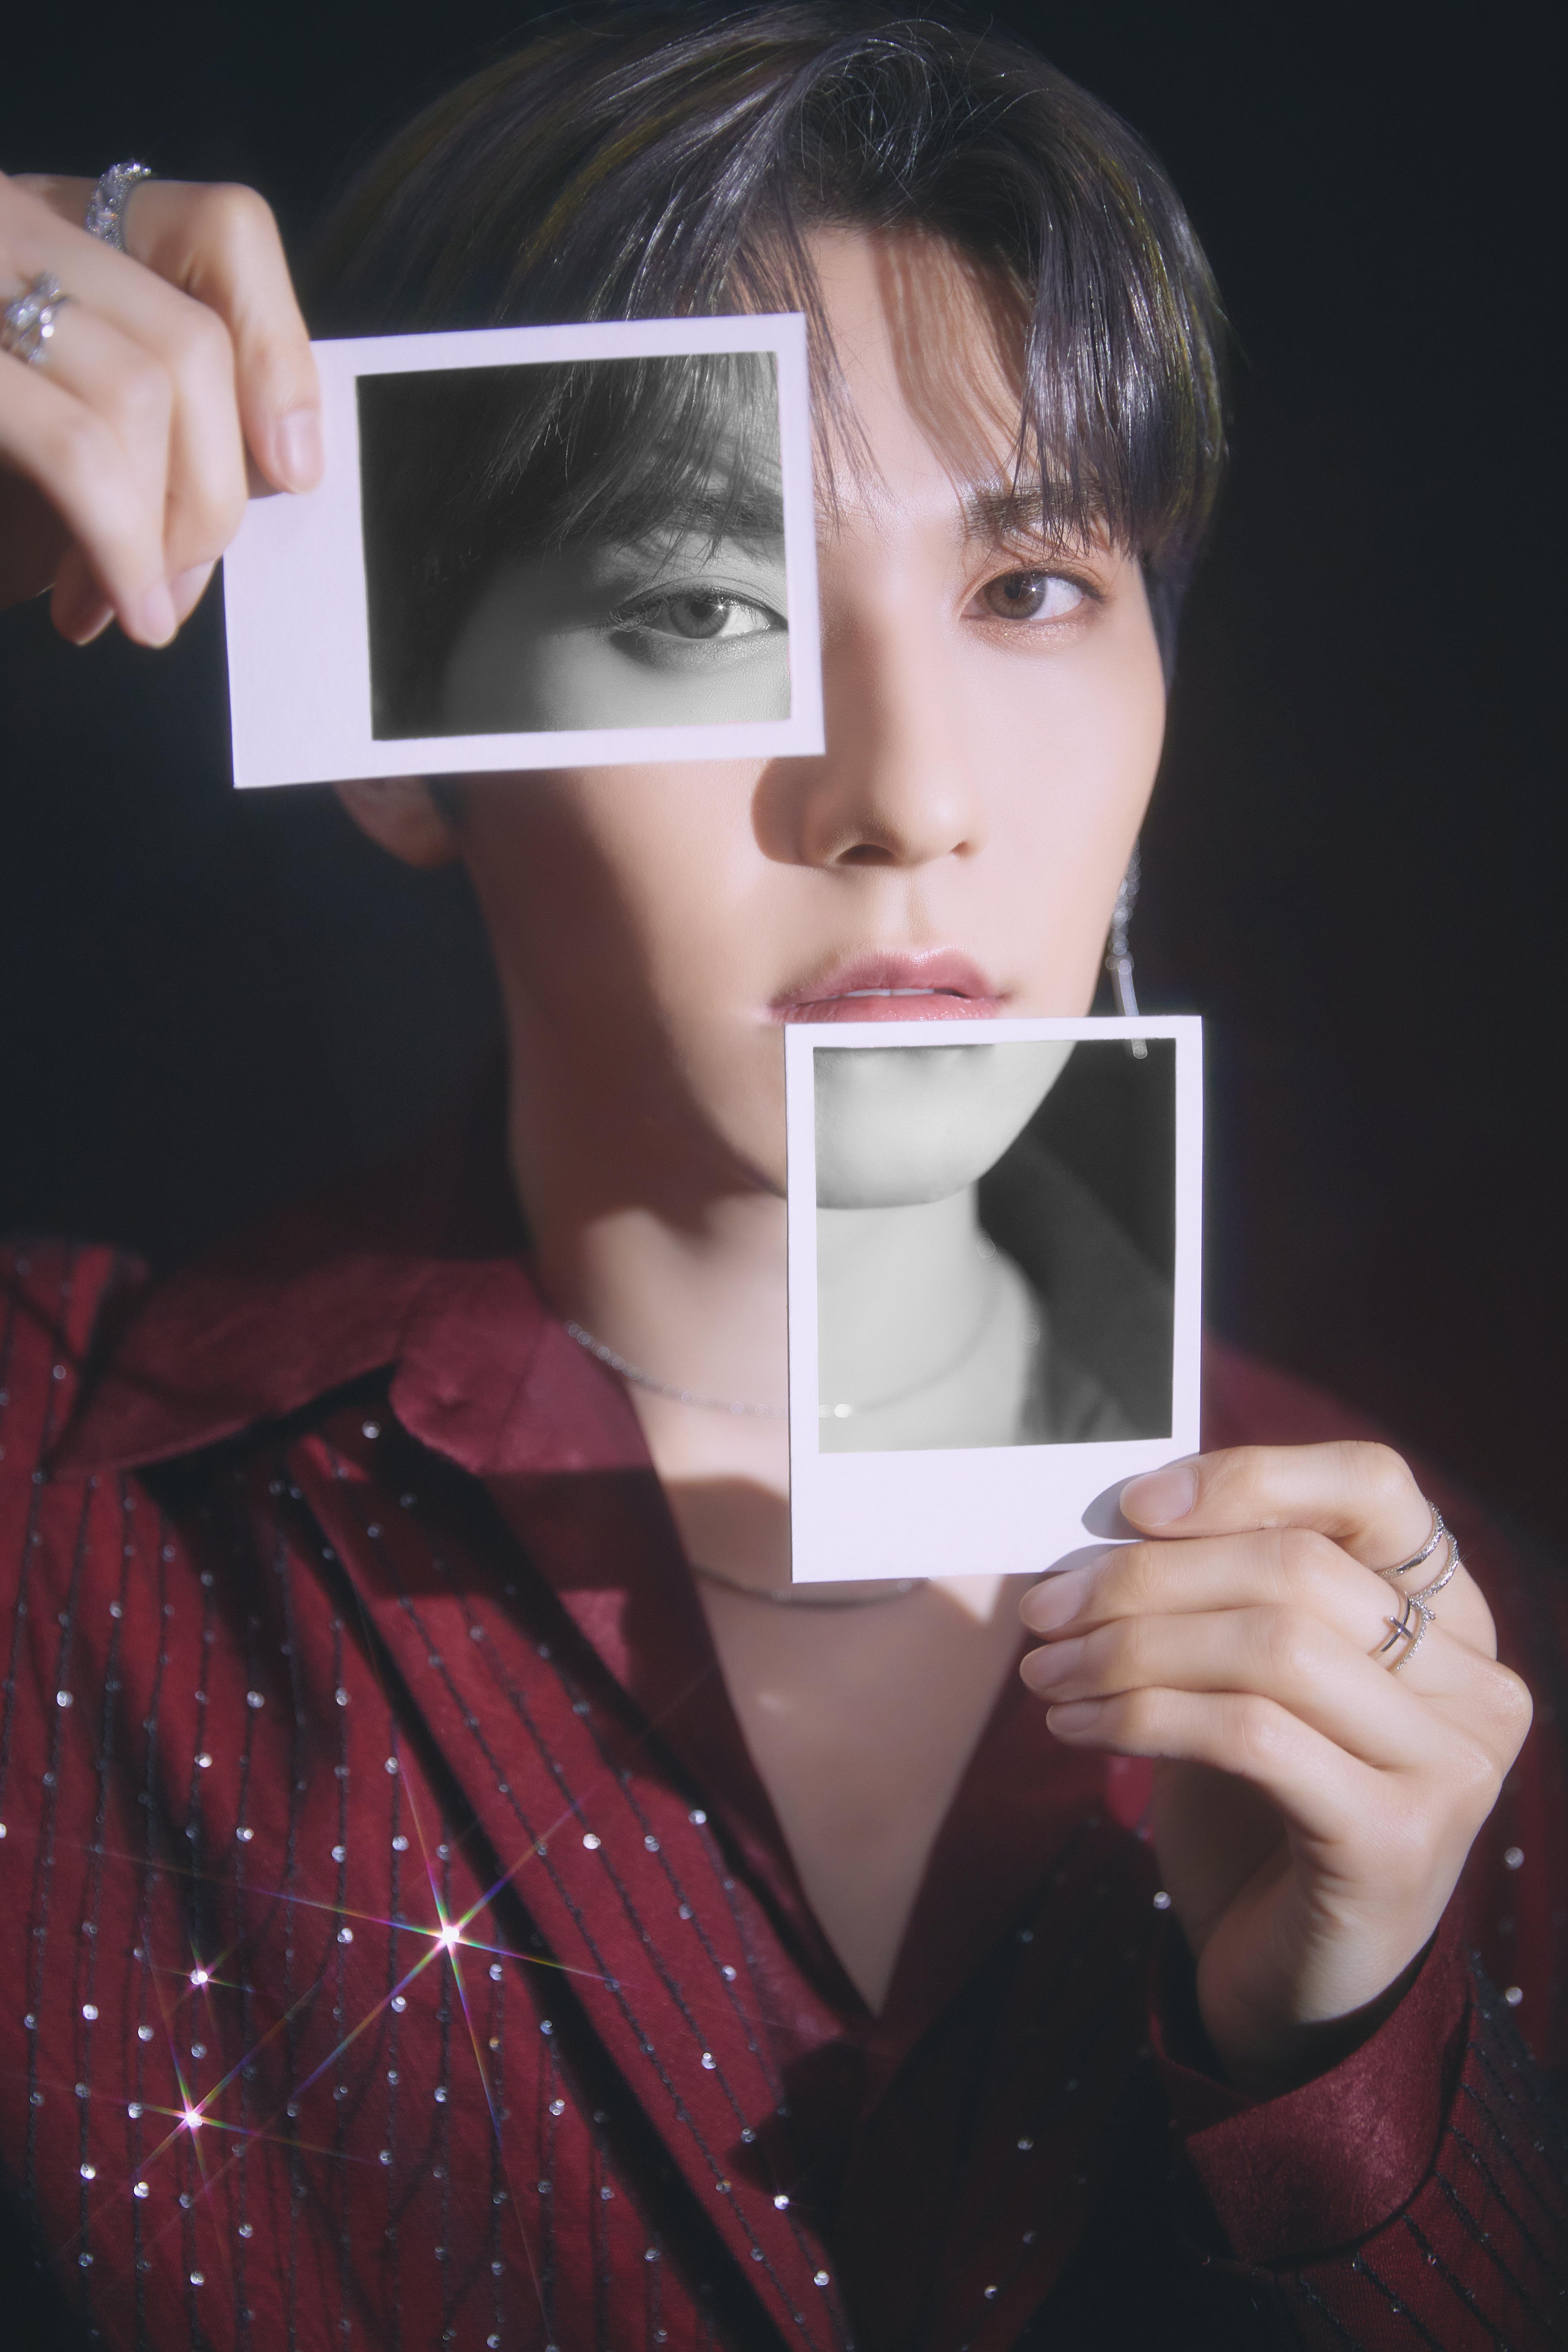 oneus_binary_code_black_mirror_concept_keonhee